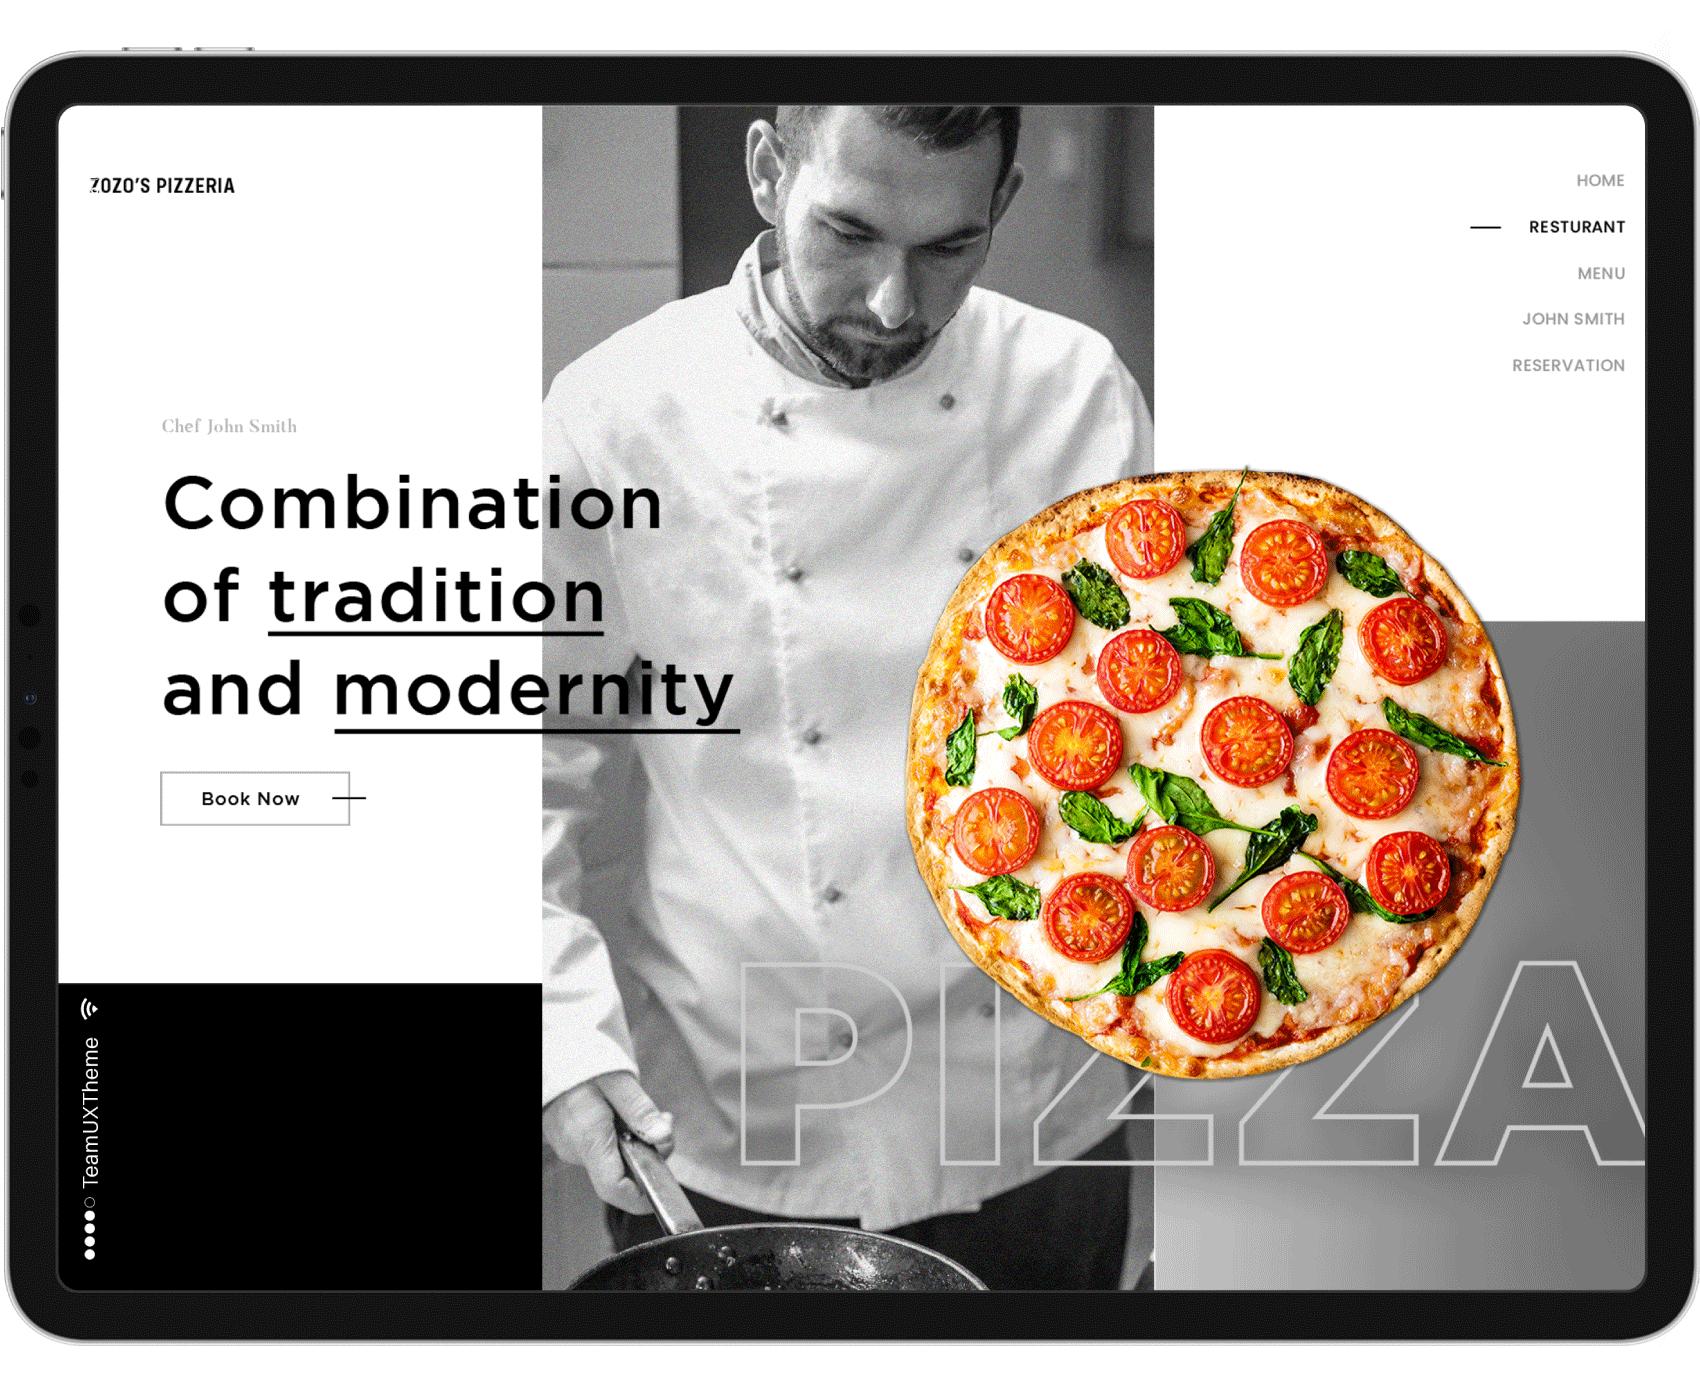 Pizza Restaurant Website On Ipad